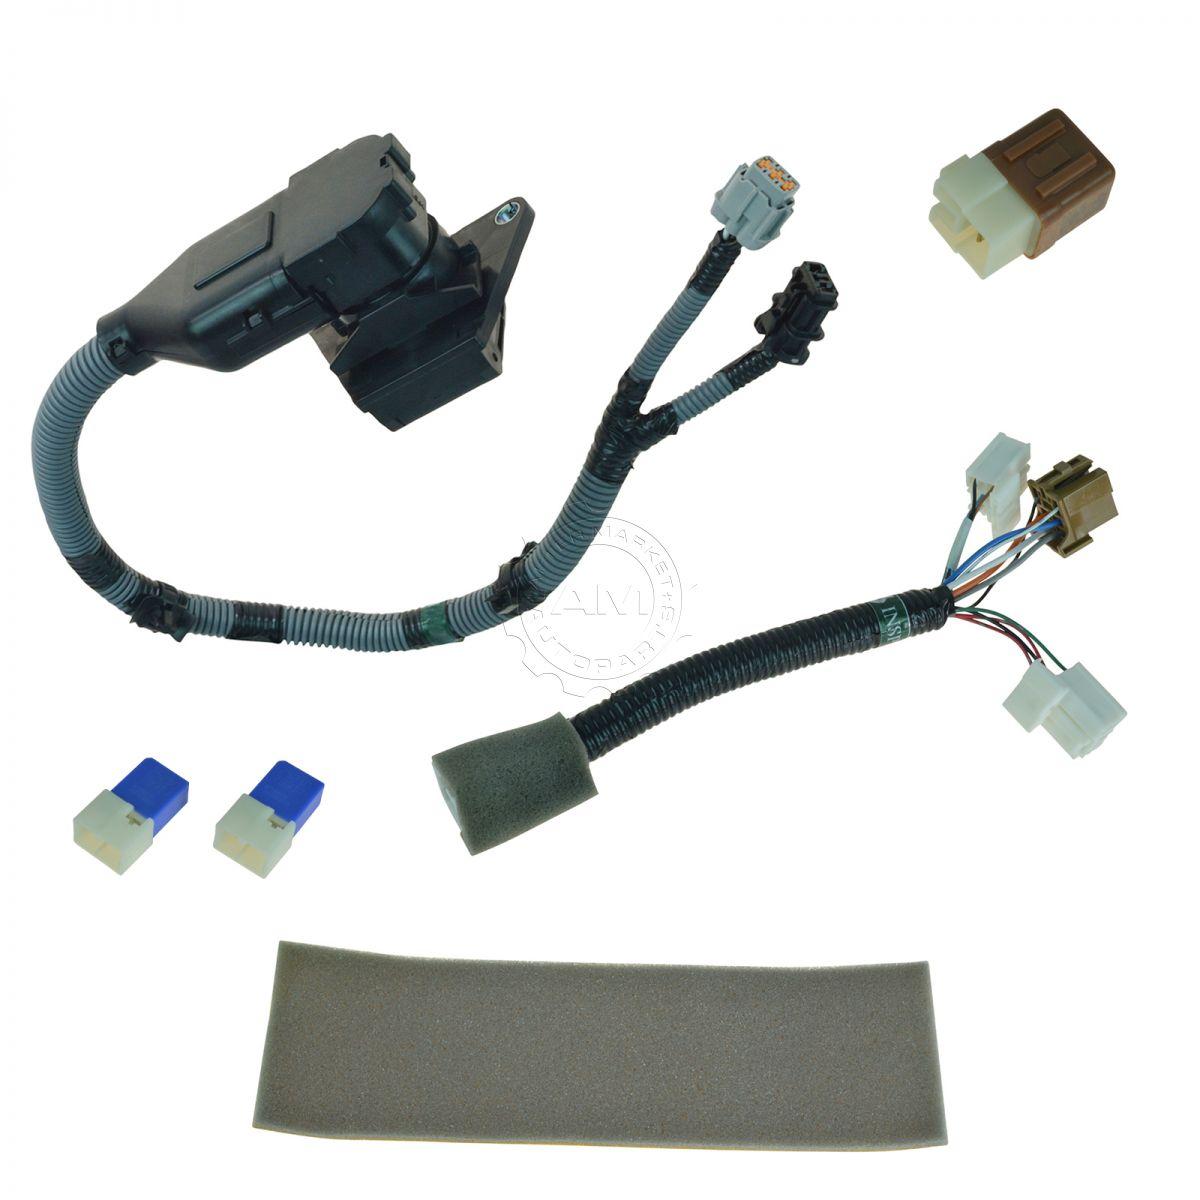 Oem 999t8br020 Complete 7 Pin Plug  U0026 Play Tow Harness Kit